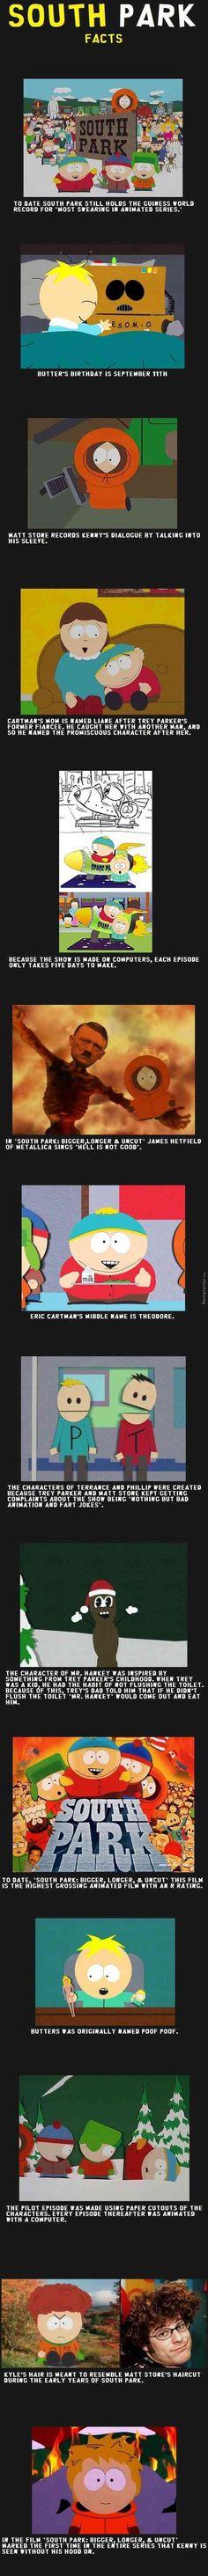 Magnet NEW UNUSED South Park Cartman Plot Against Me